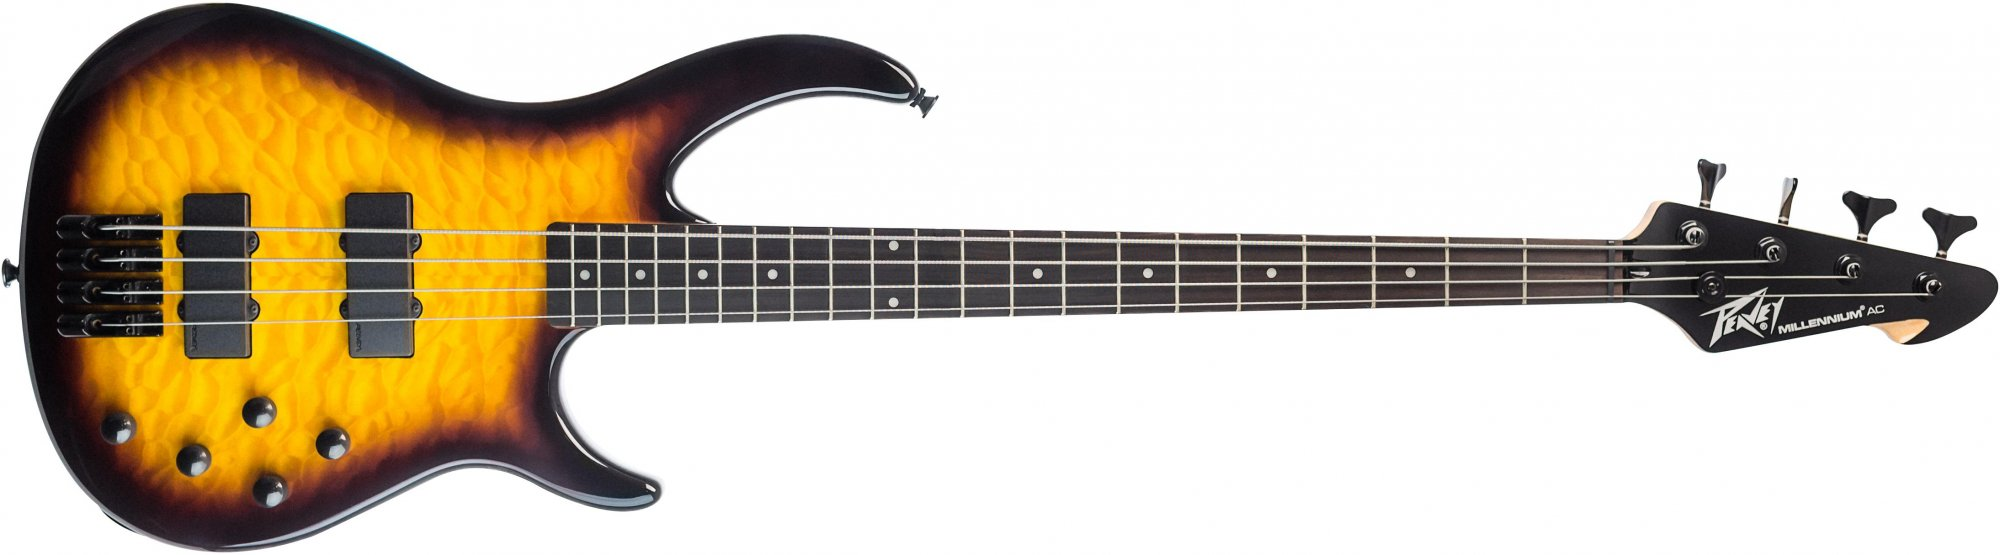 Peavey Millennium AC 4 Vintage Burst 4 String Bass Guitar